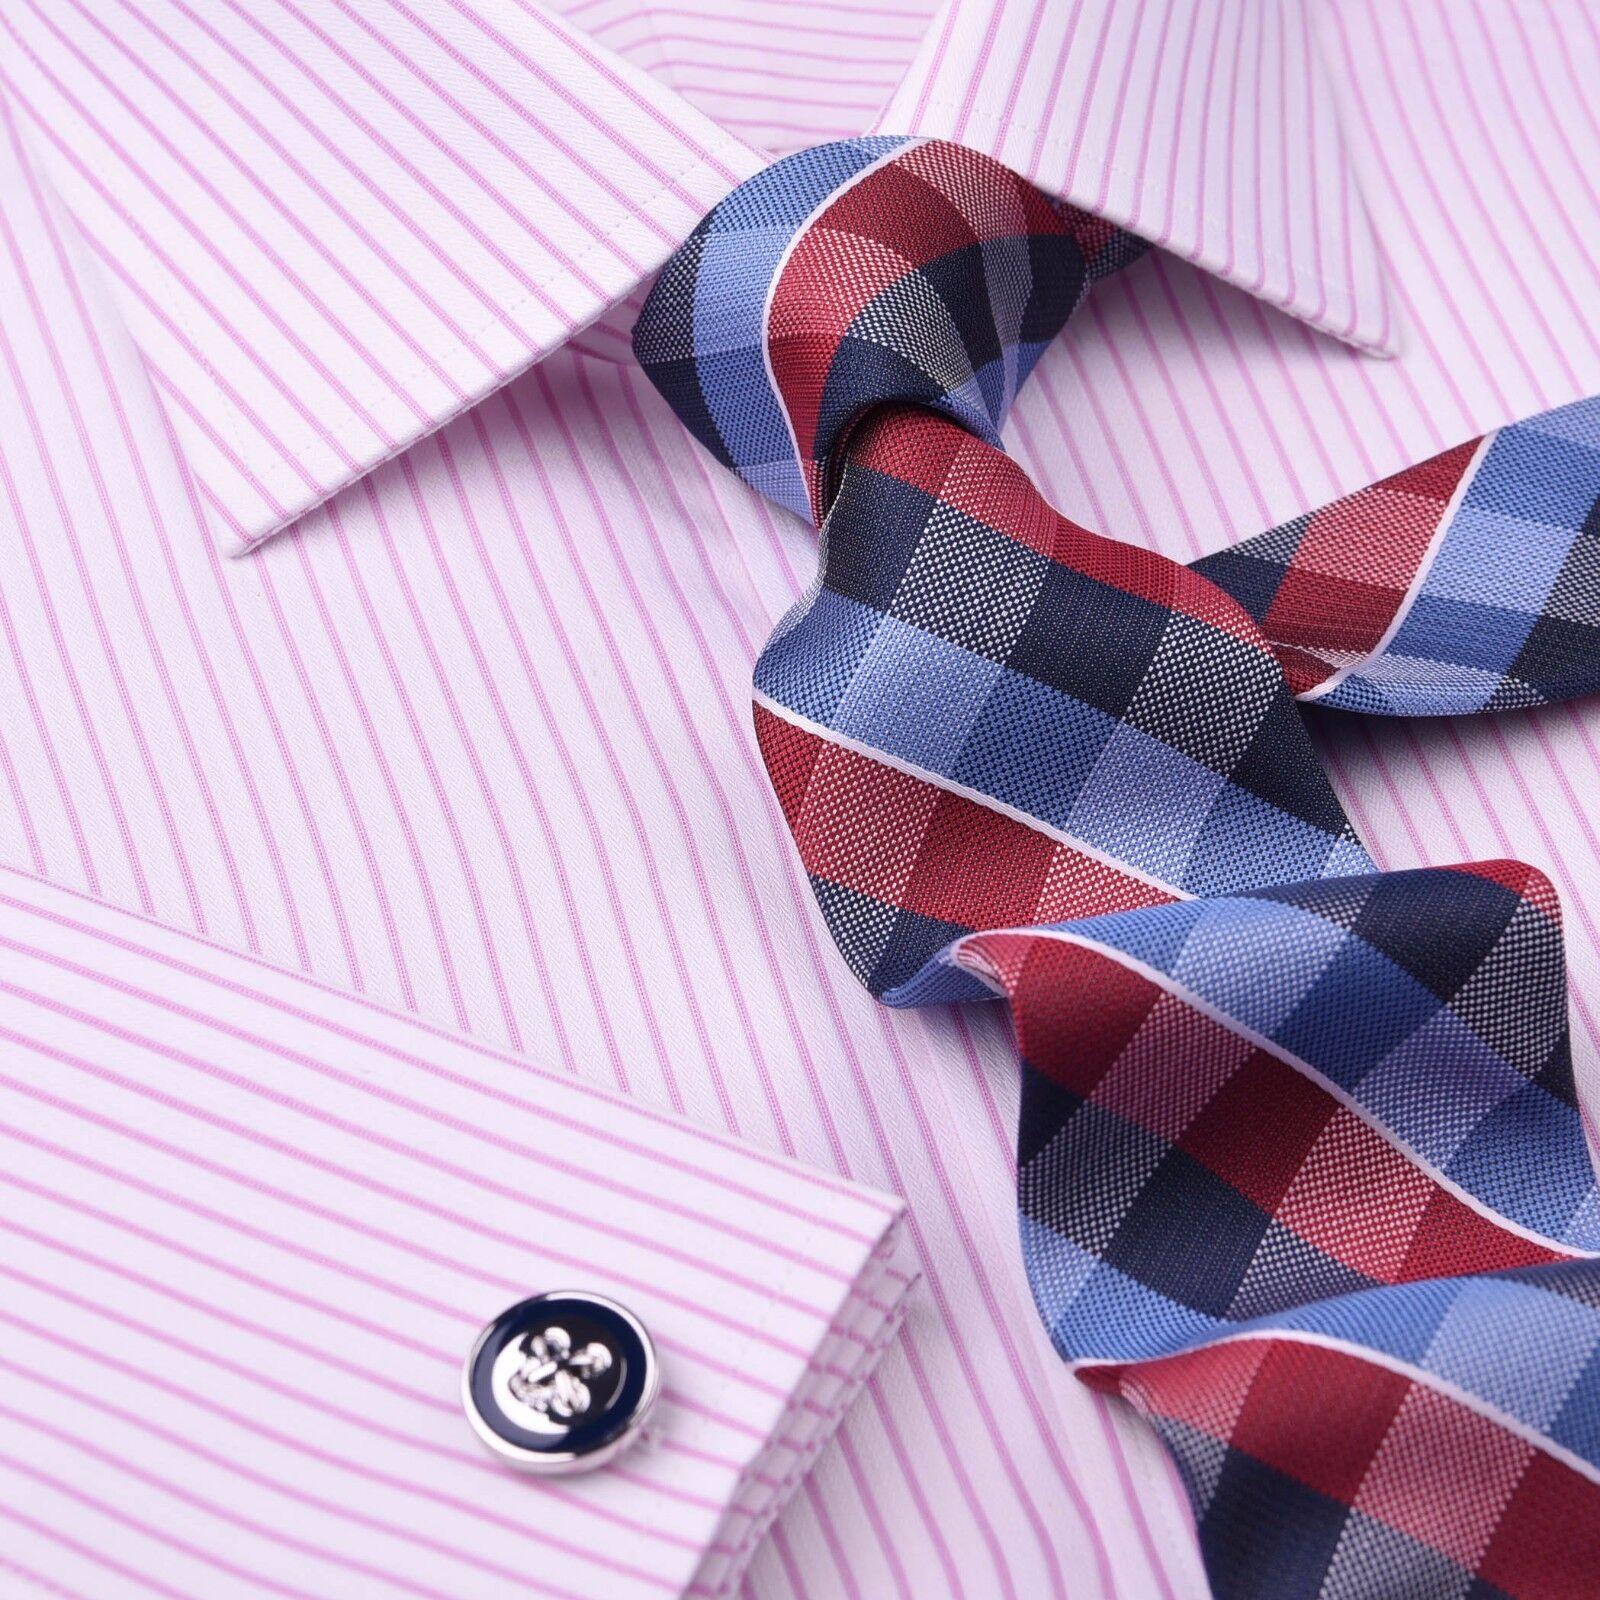 Light Pink Striped Formal Business Dress Shirt Classic Thin Designer Fashion Top